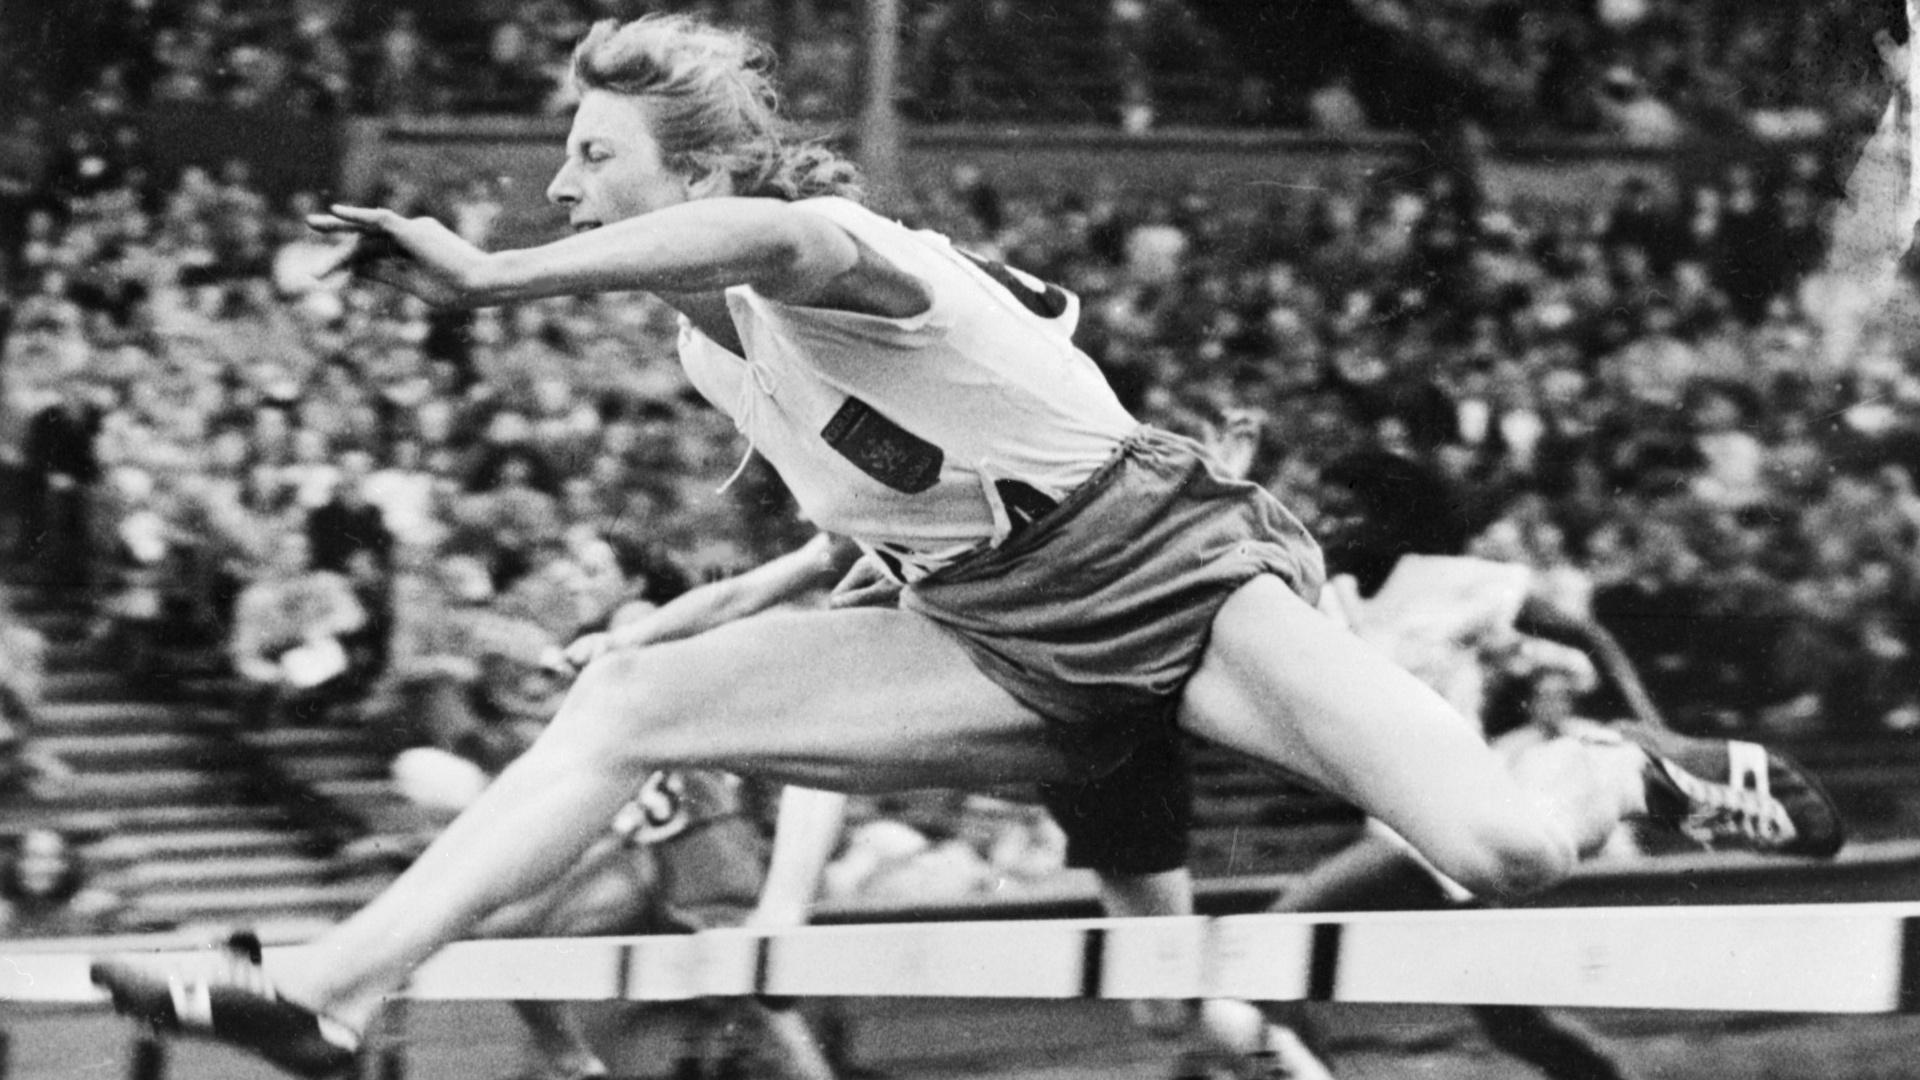 A holandesa Fanny Blankers-Koen participa dos 80 m com barreiras na Olimpíada de Londres-1948